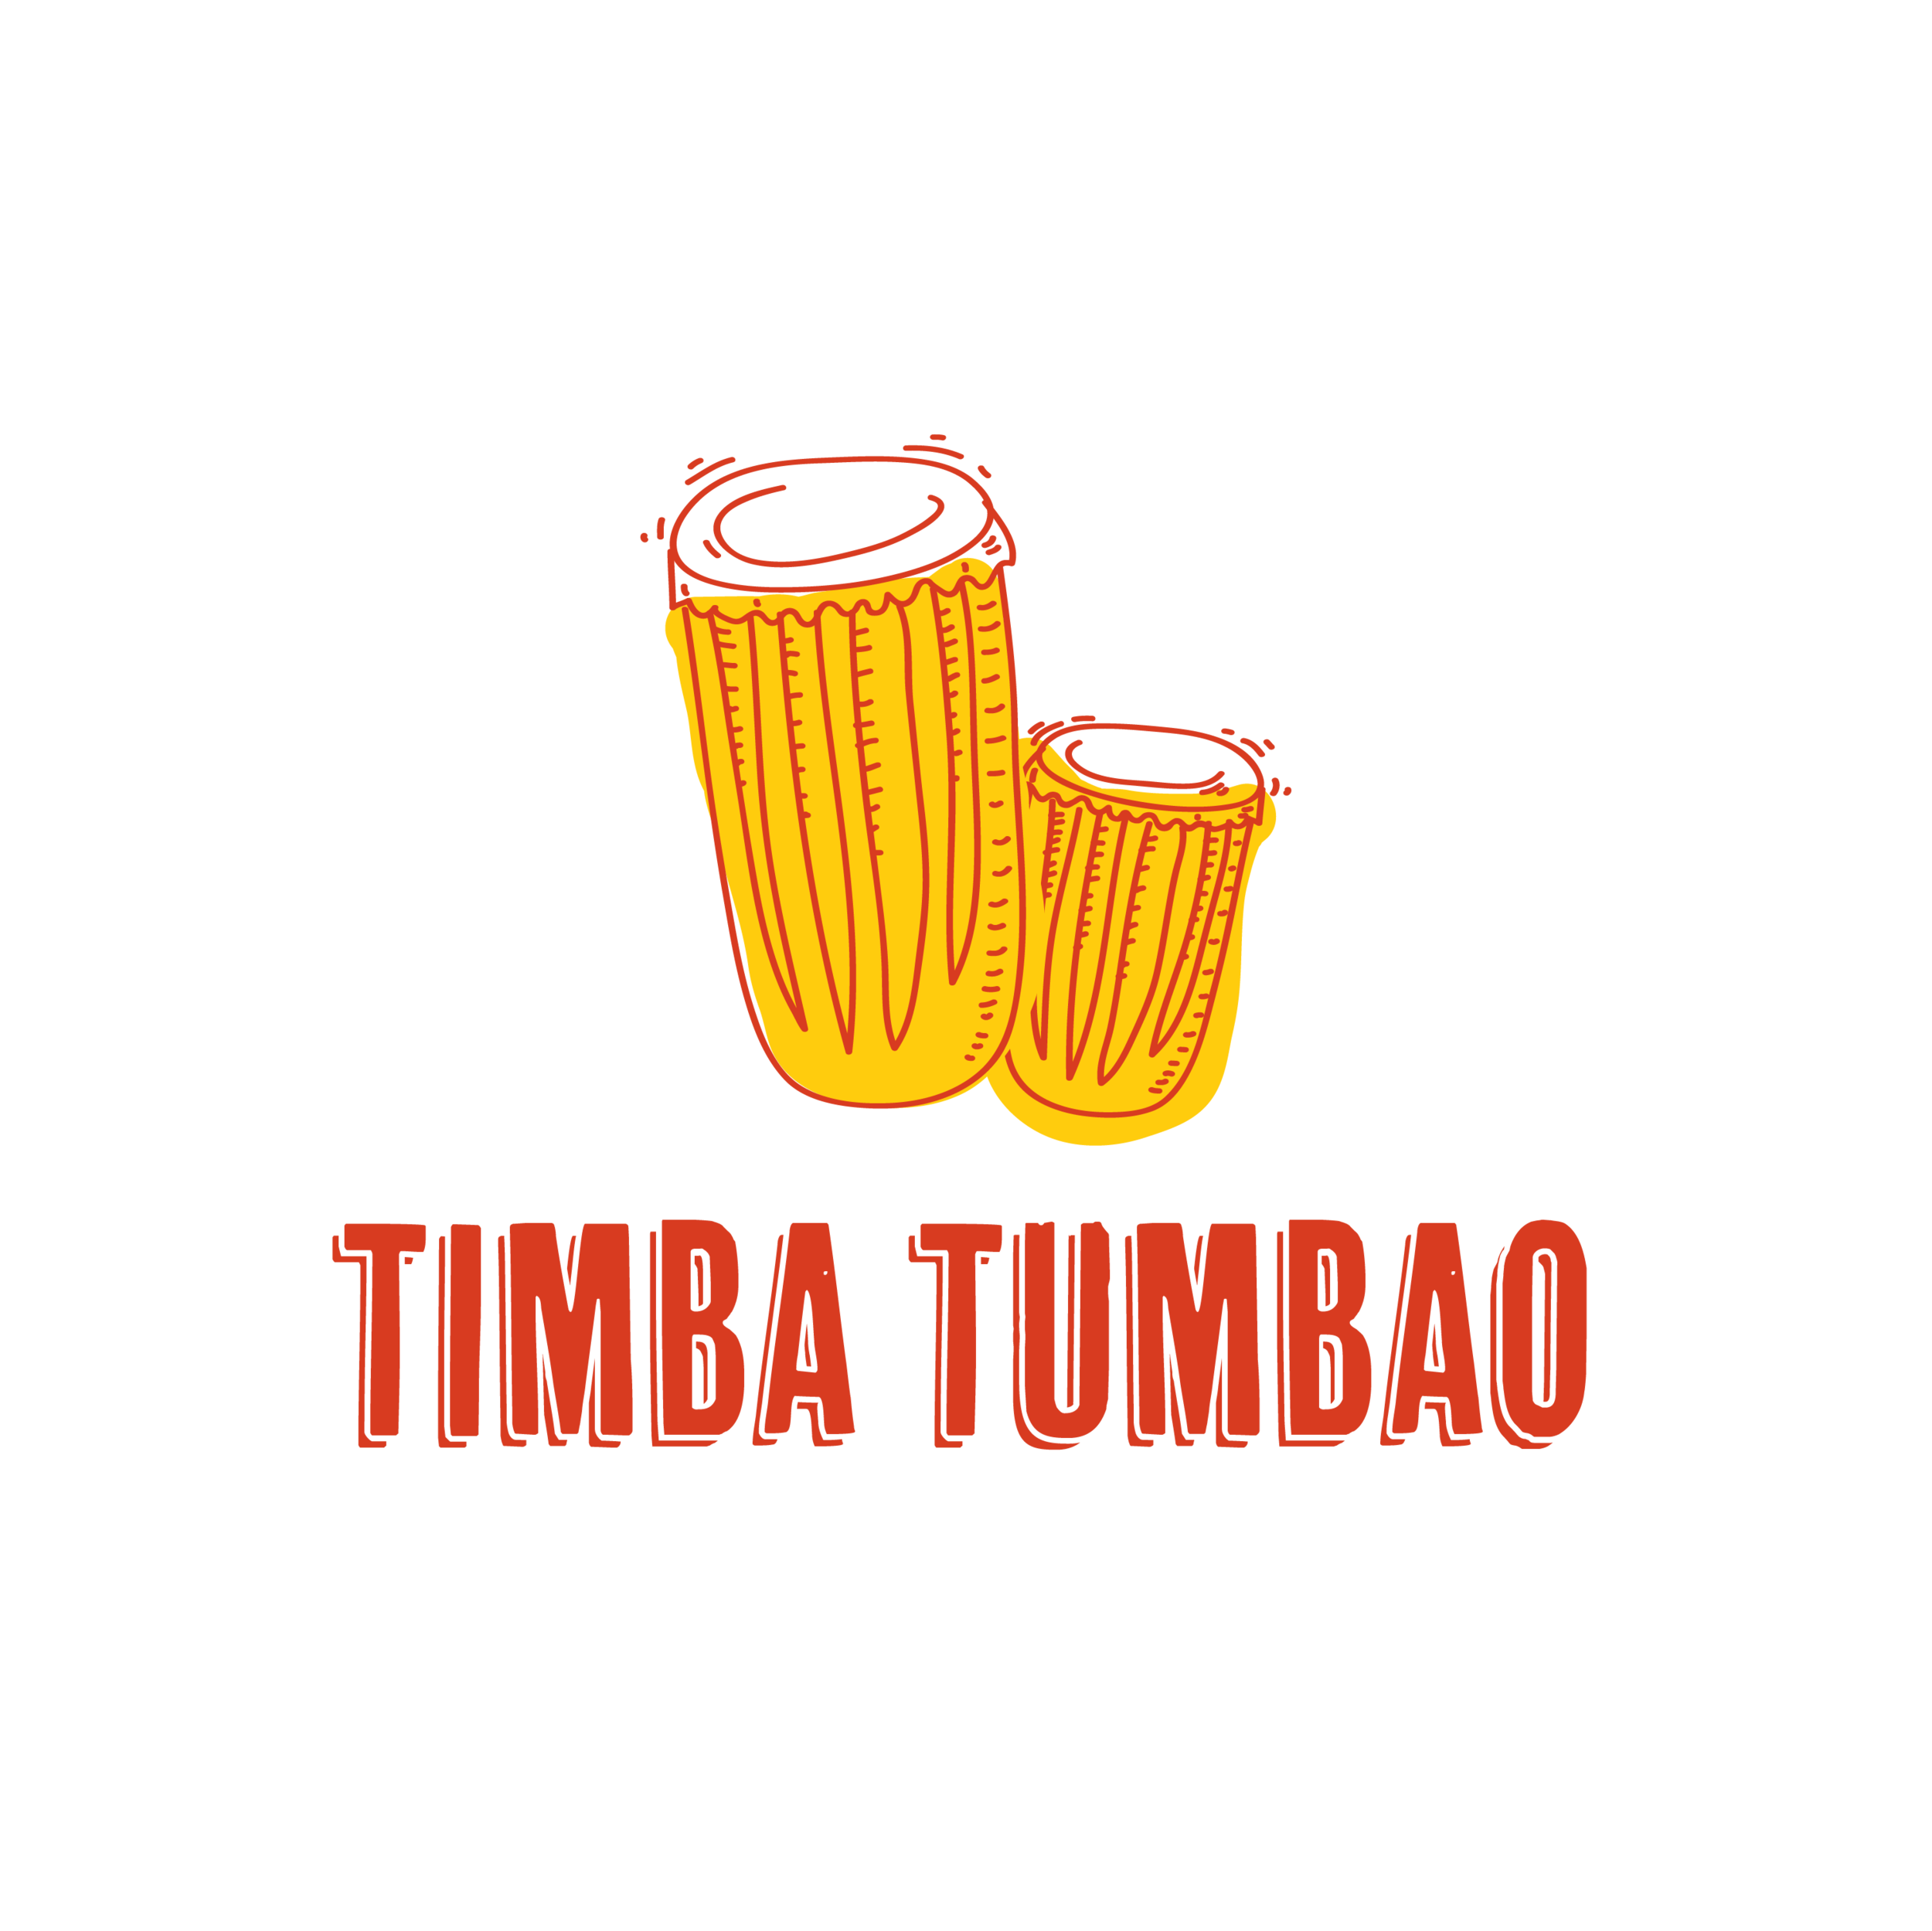 TimbaTumbao_altlogo-02.png